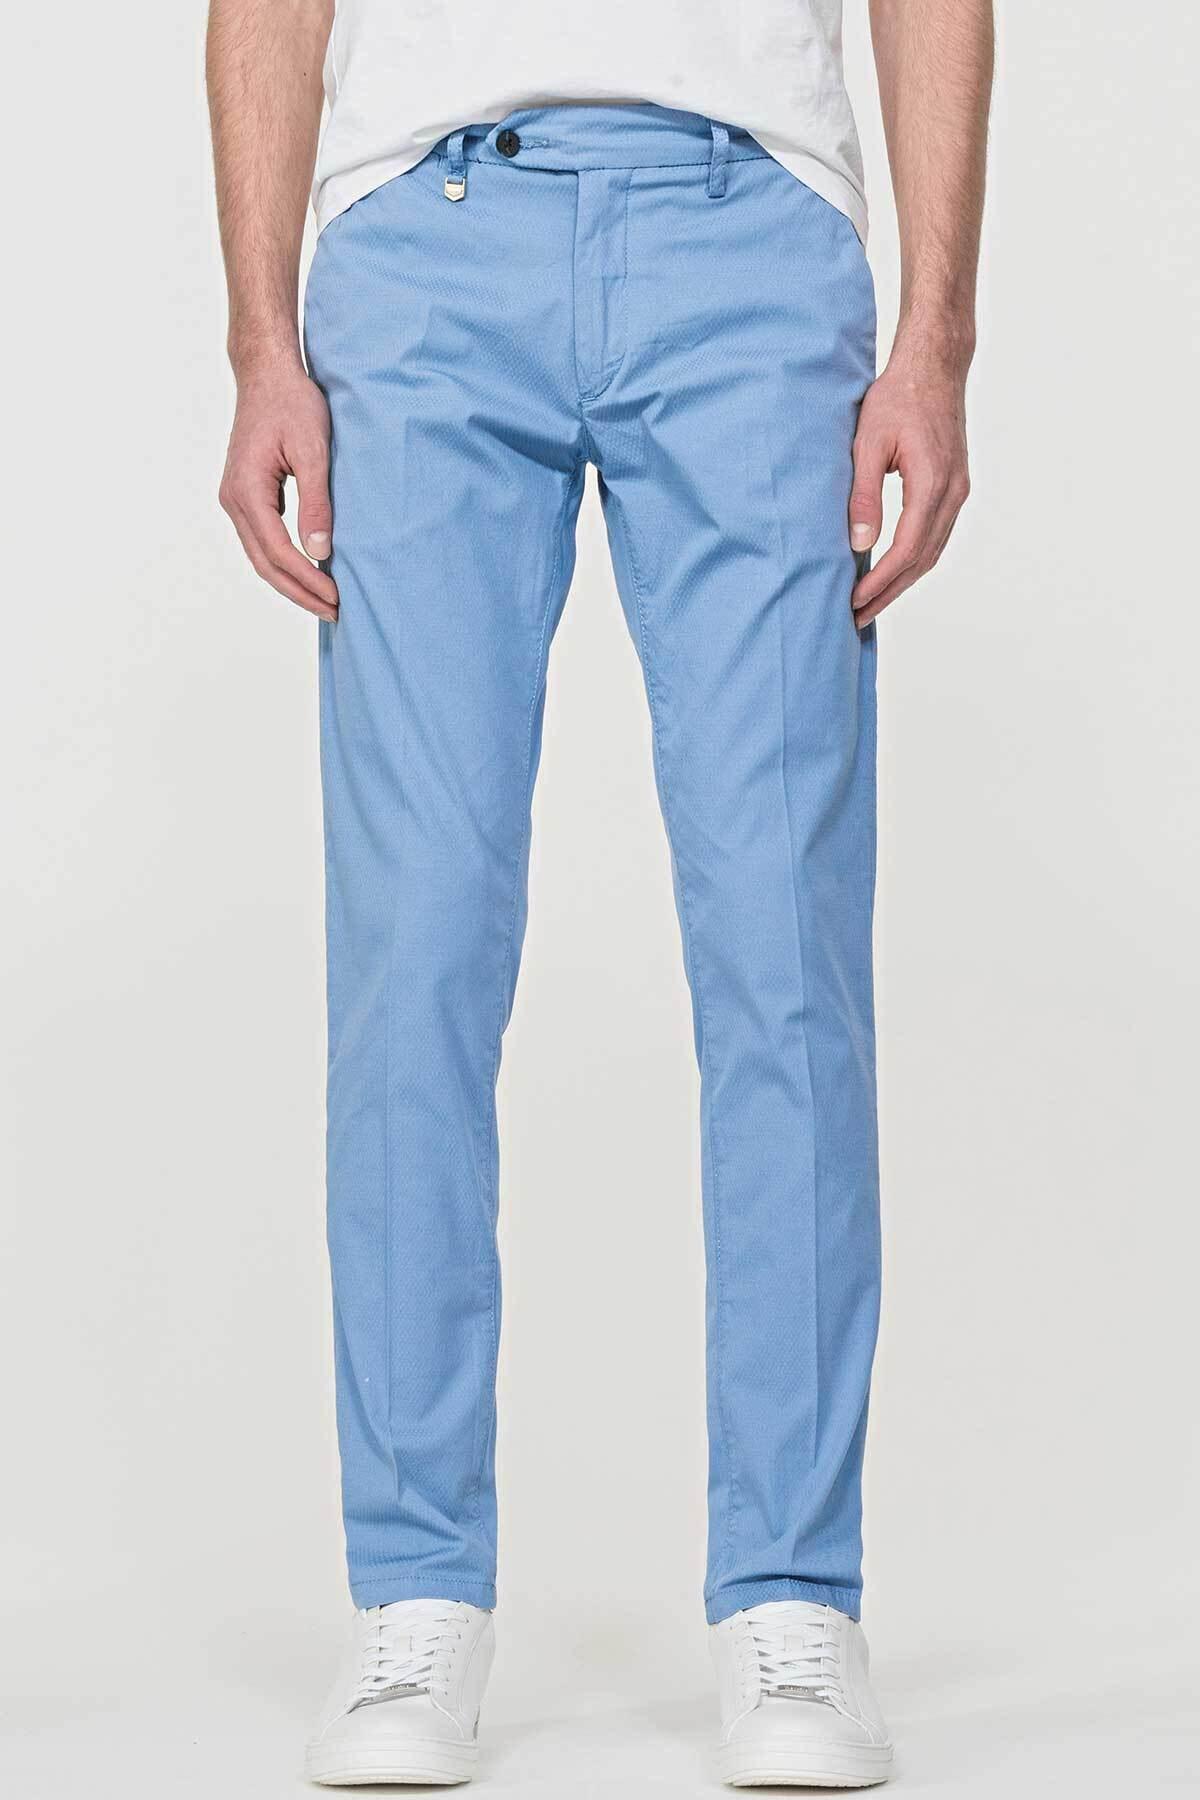 Antony Morato Bryan Skinny Fit Pantolon 1